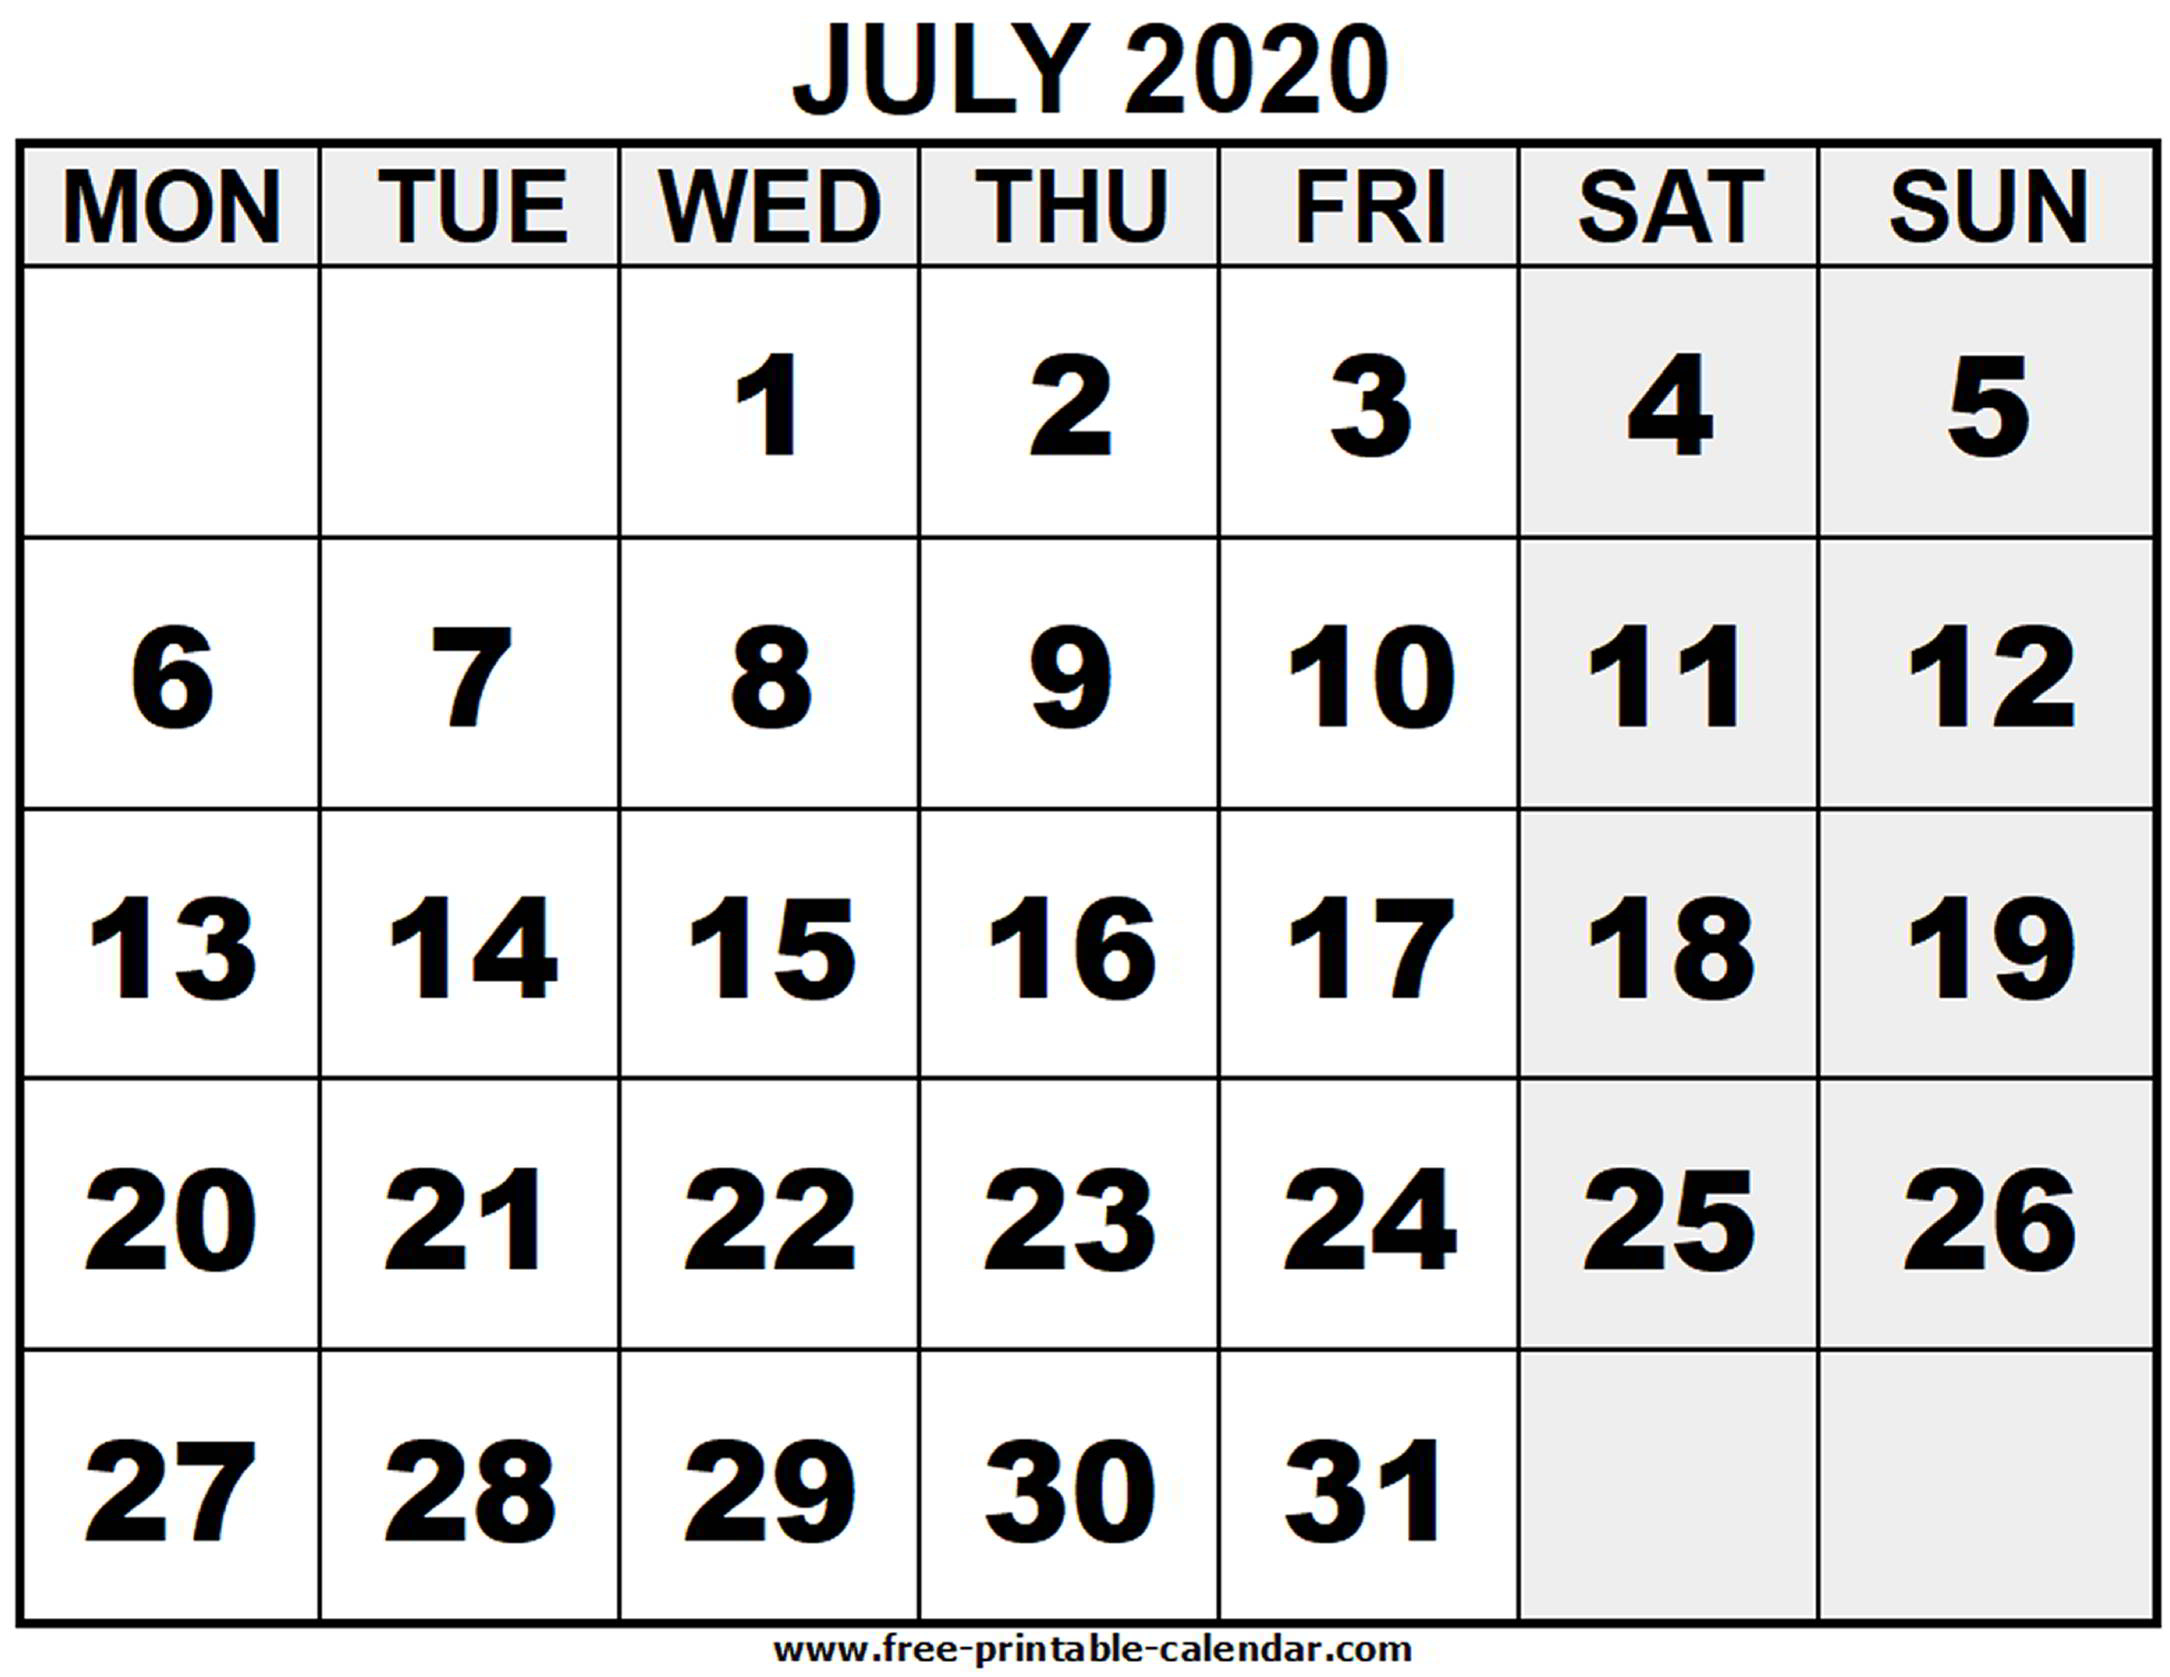 2020 July - Free-Printable-Calendar